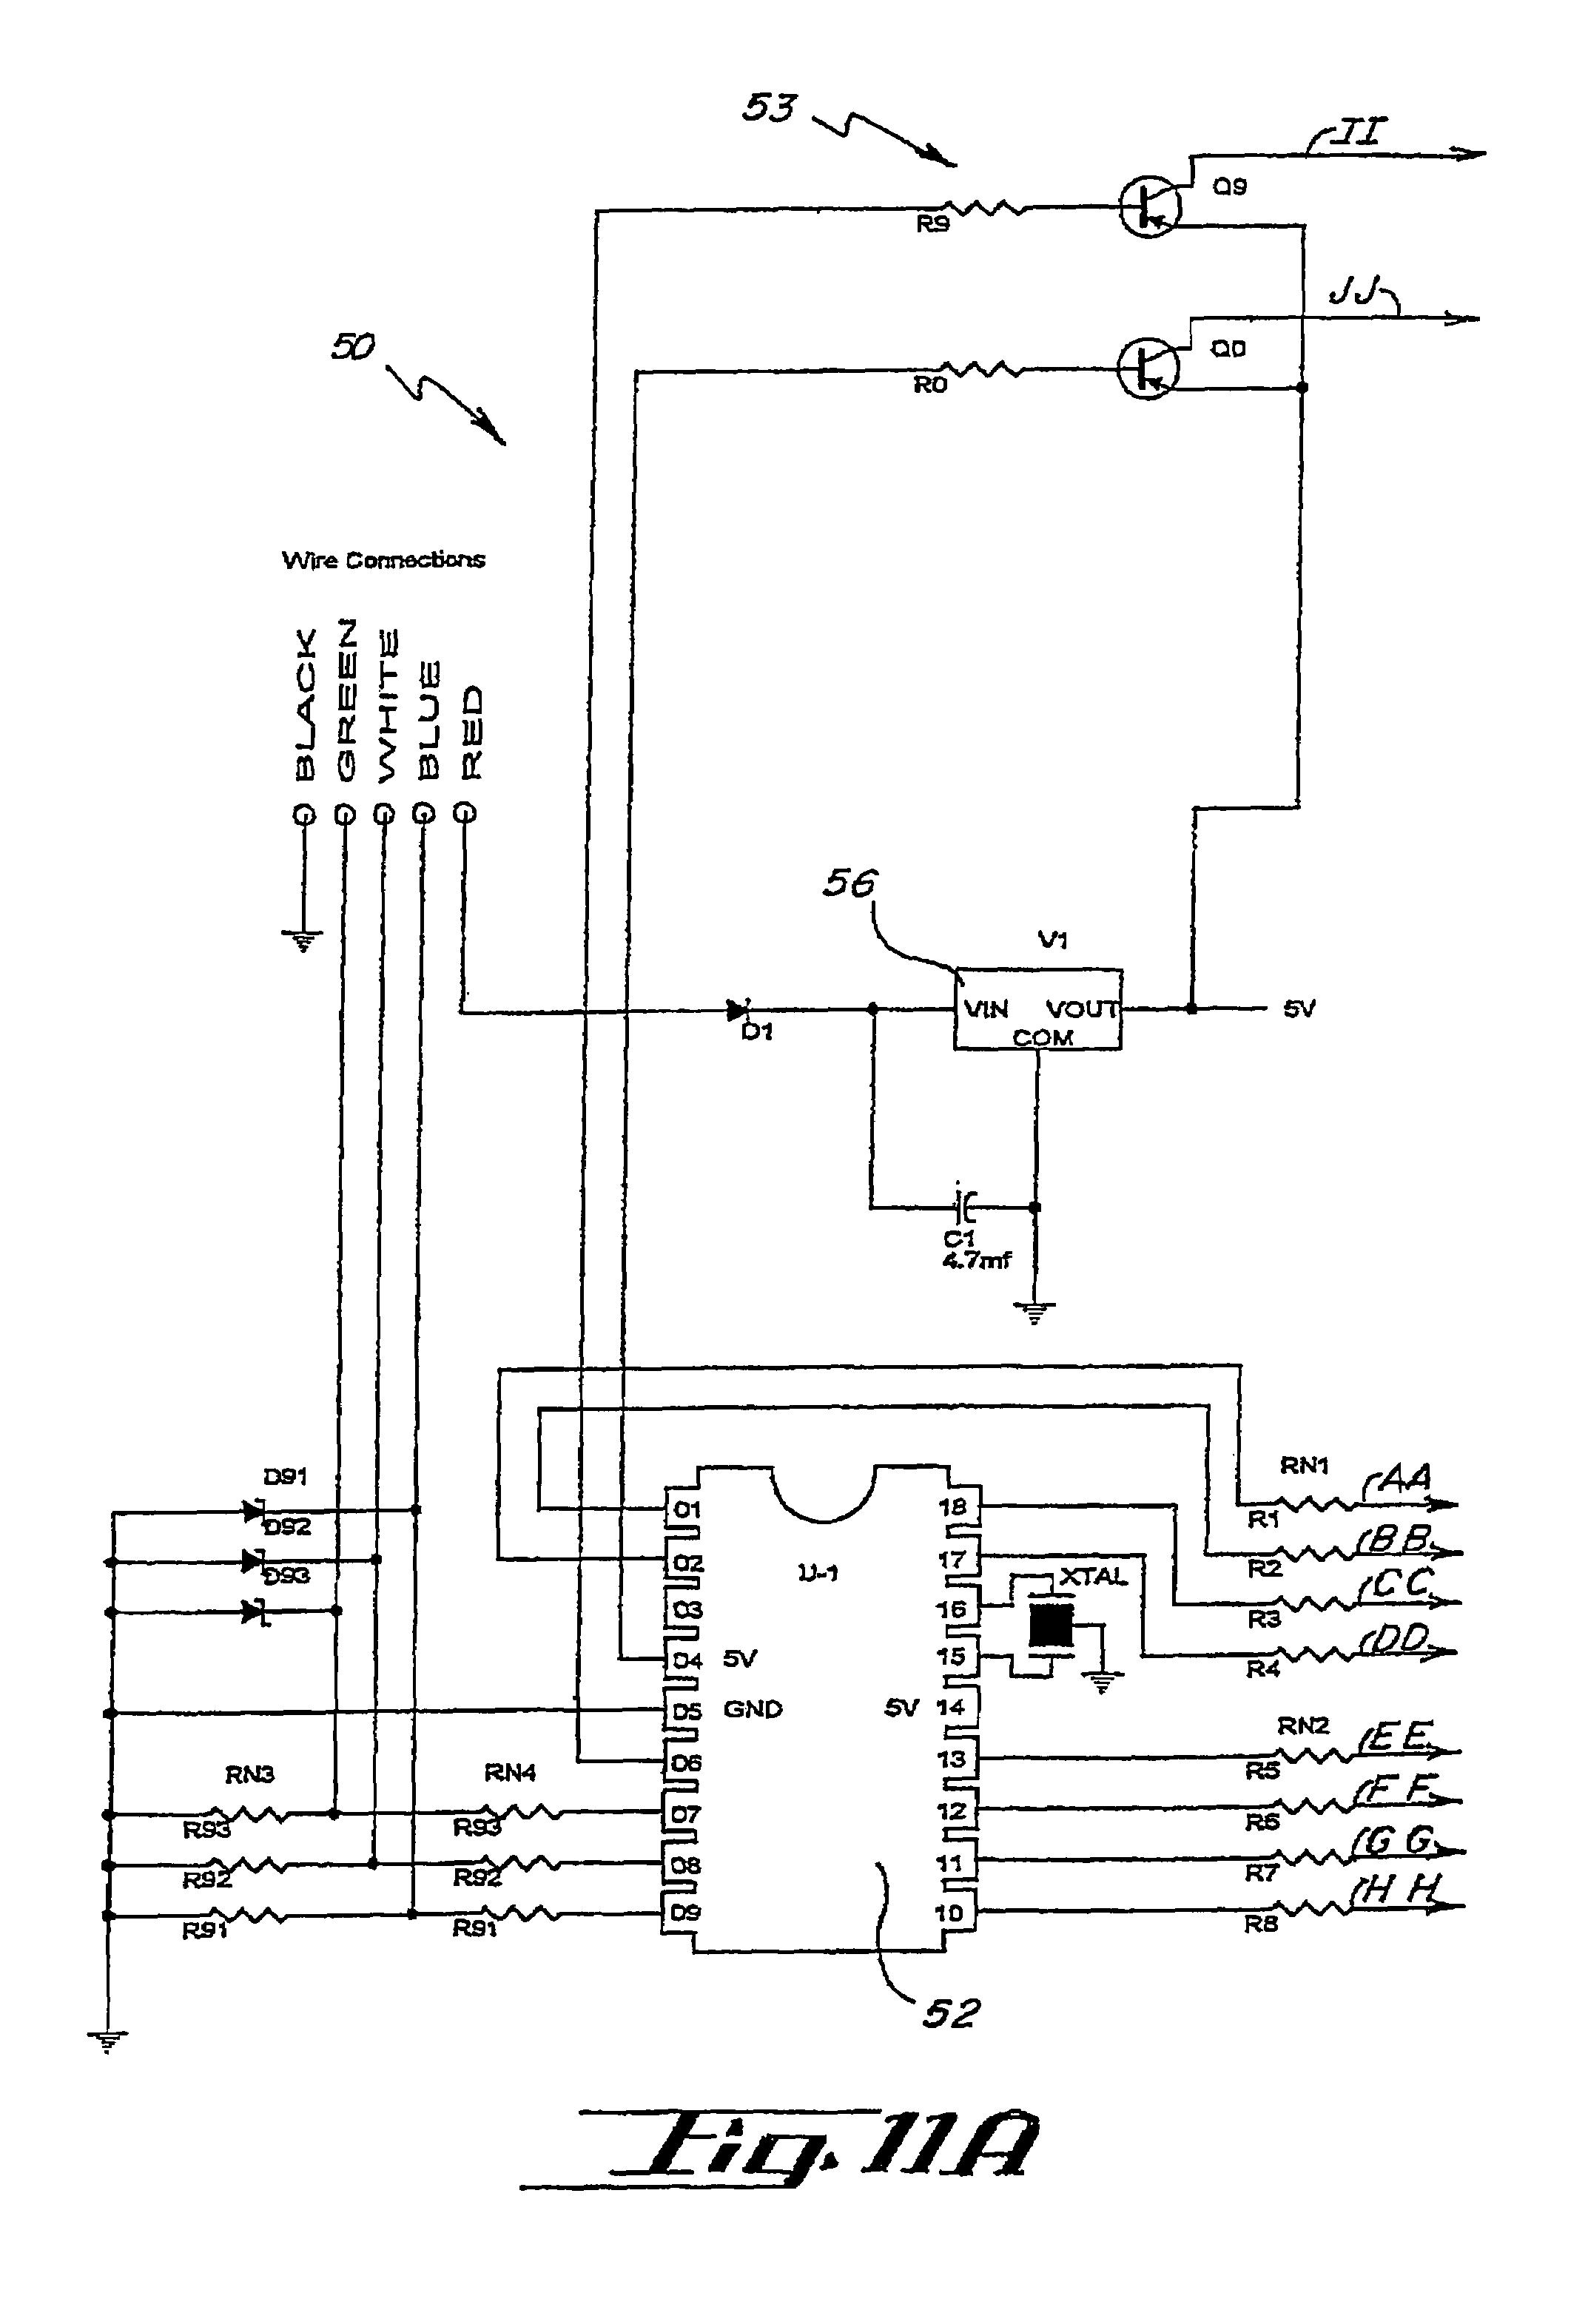 US07561036 20090714 D00005?resize\=665%2C973 whelen headlight flasher wiring diagram whelen wiring diagrams whelen 295hfsa1 wiring diagram at alyssarenee.co